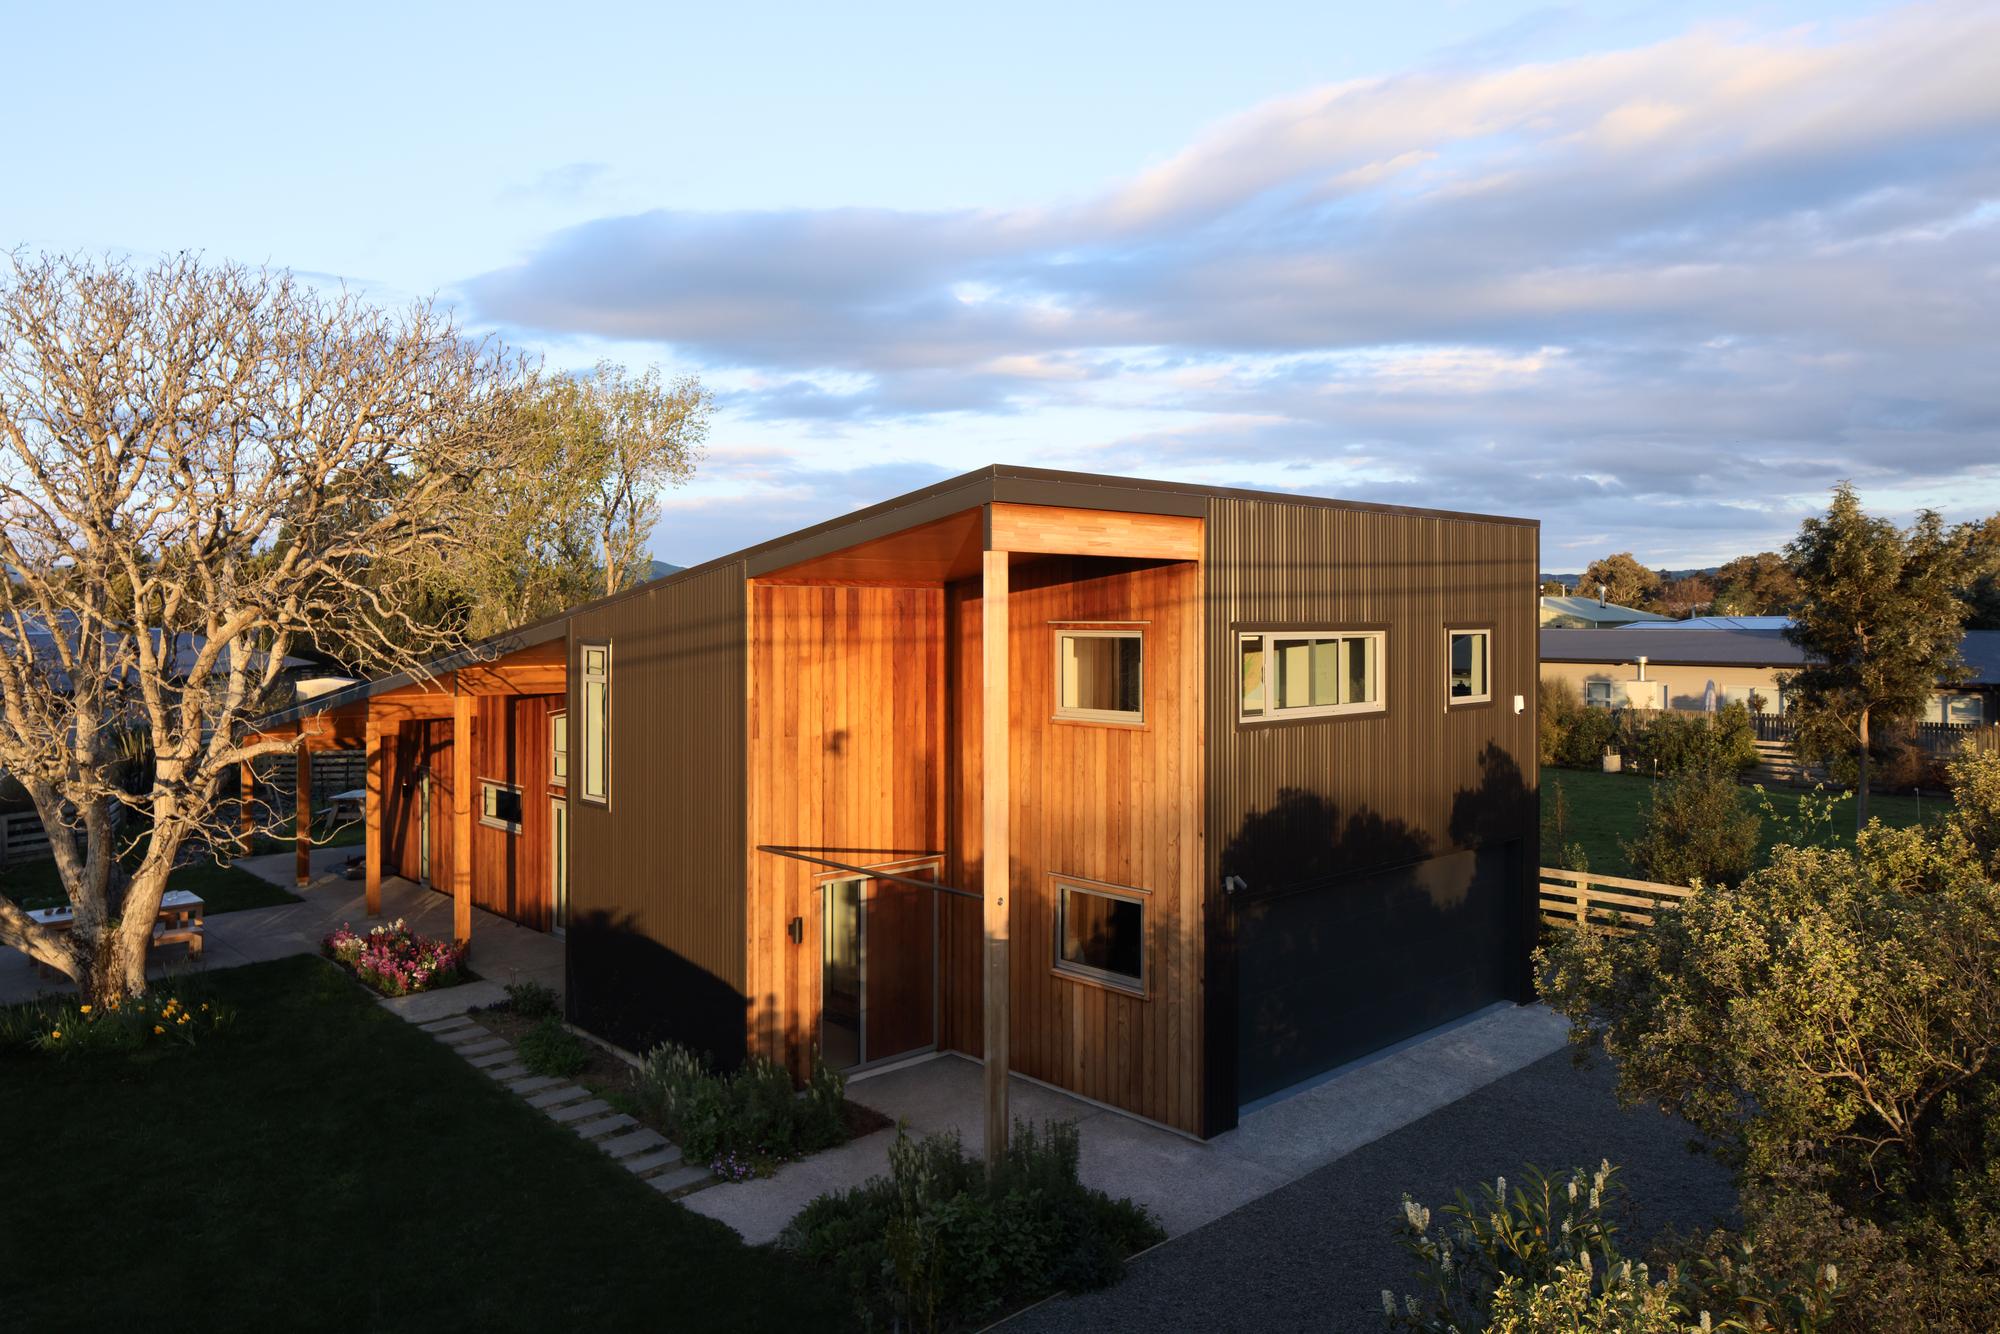 House Planes Gallery Of The Wairarapa Haybarn First Light Studio 6